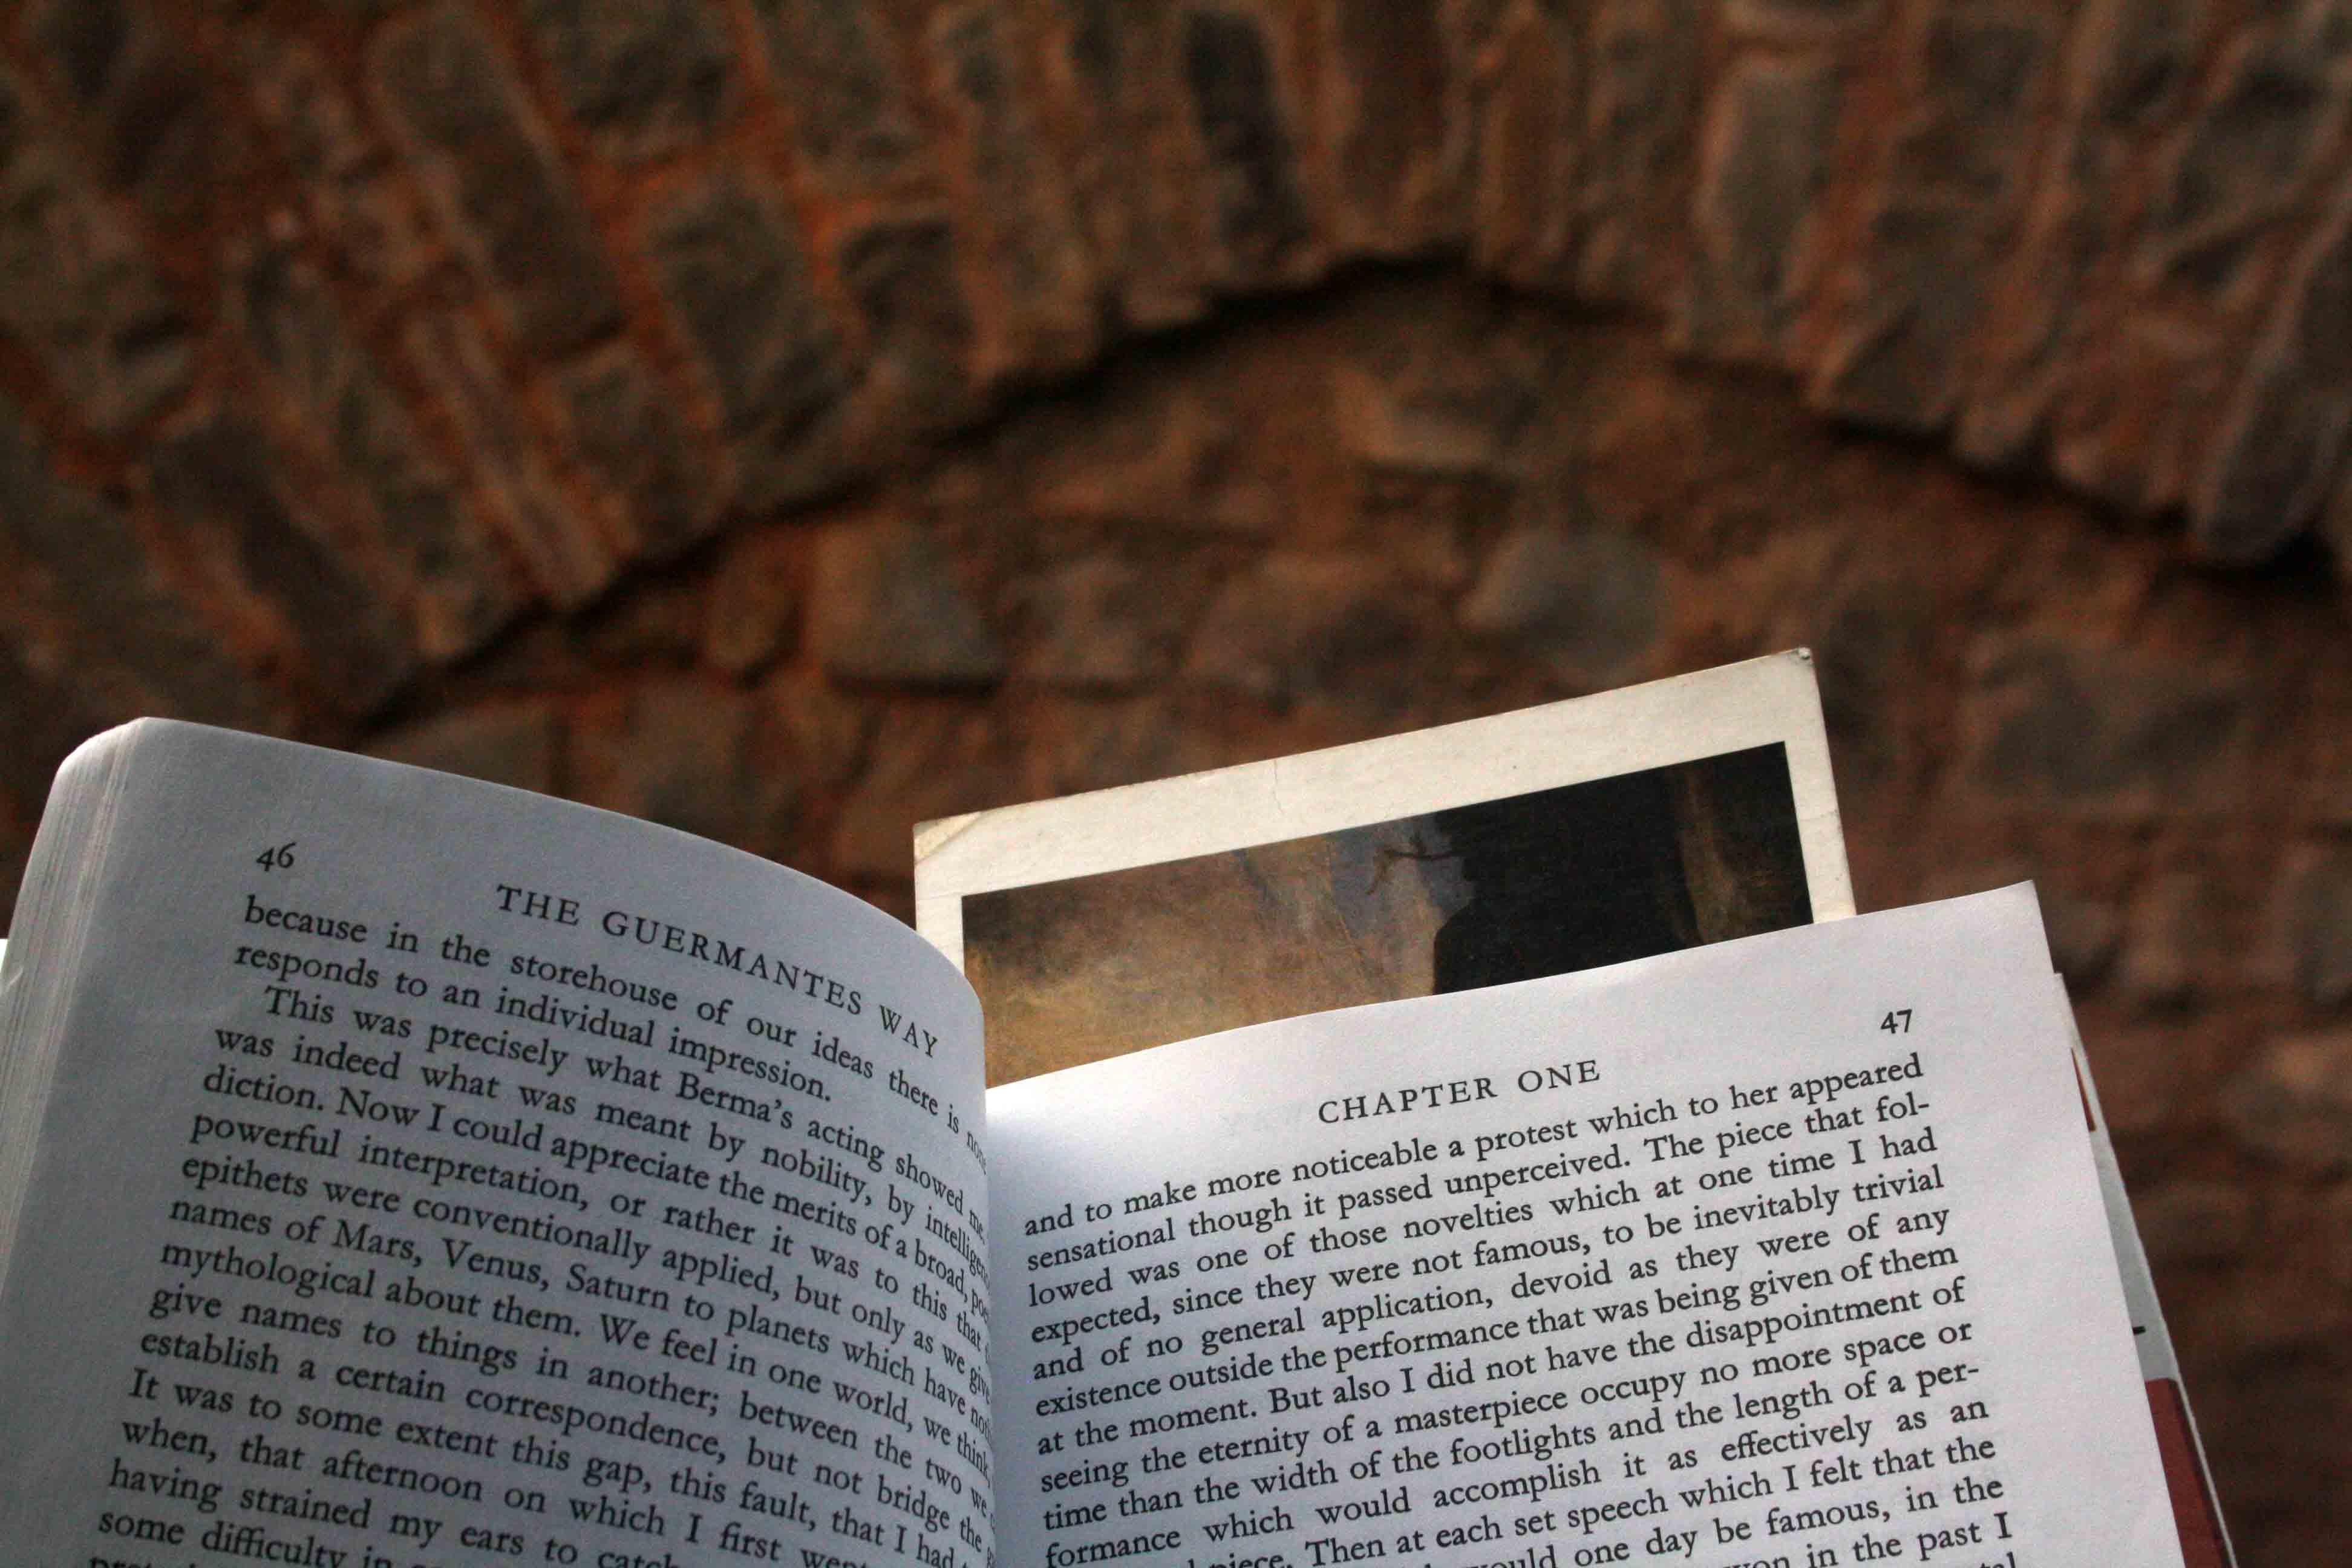 City Reading – The Delhi Proustians XXXI, Nicholson Road